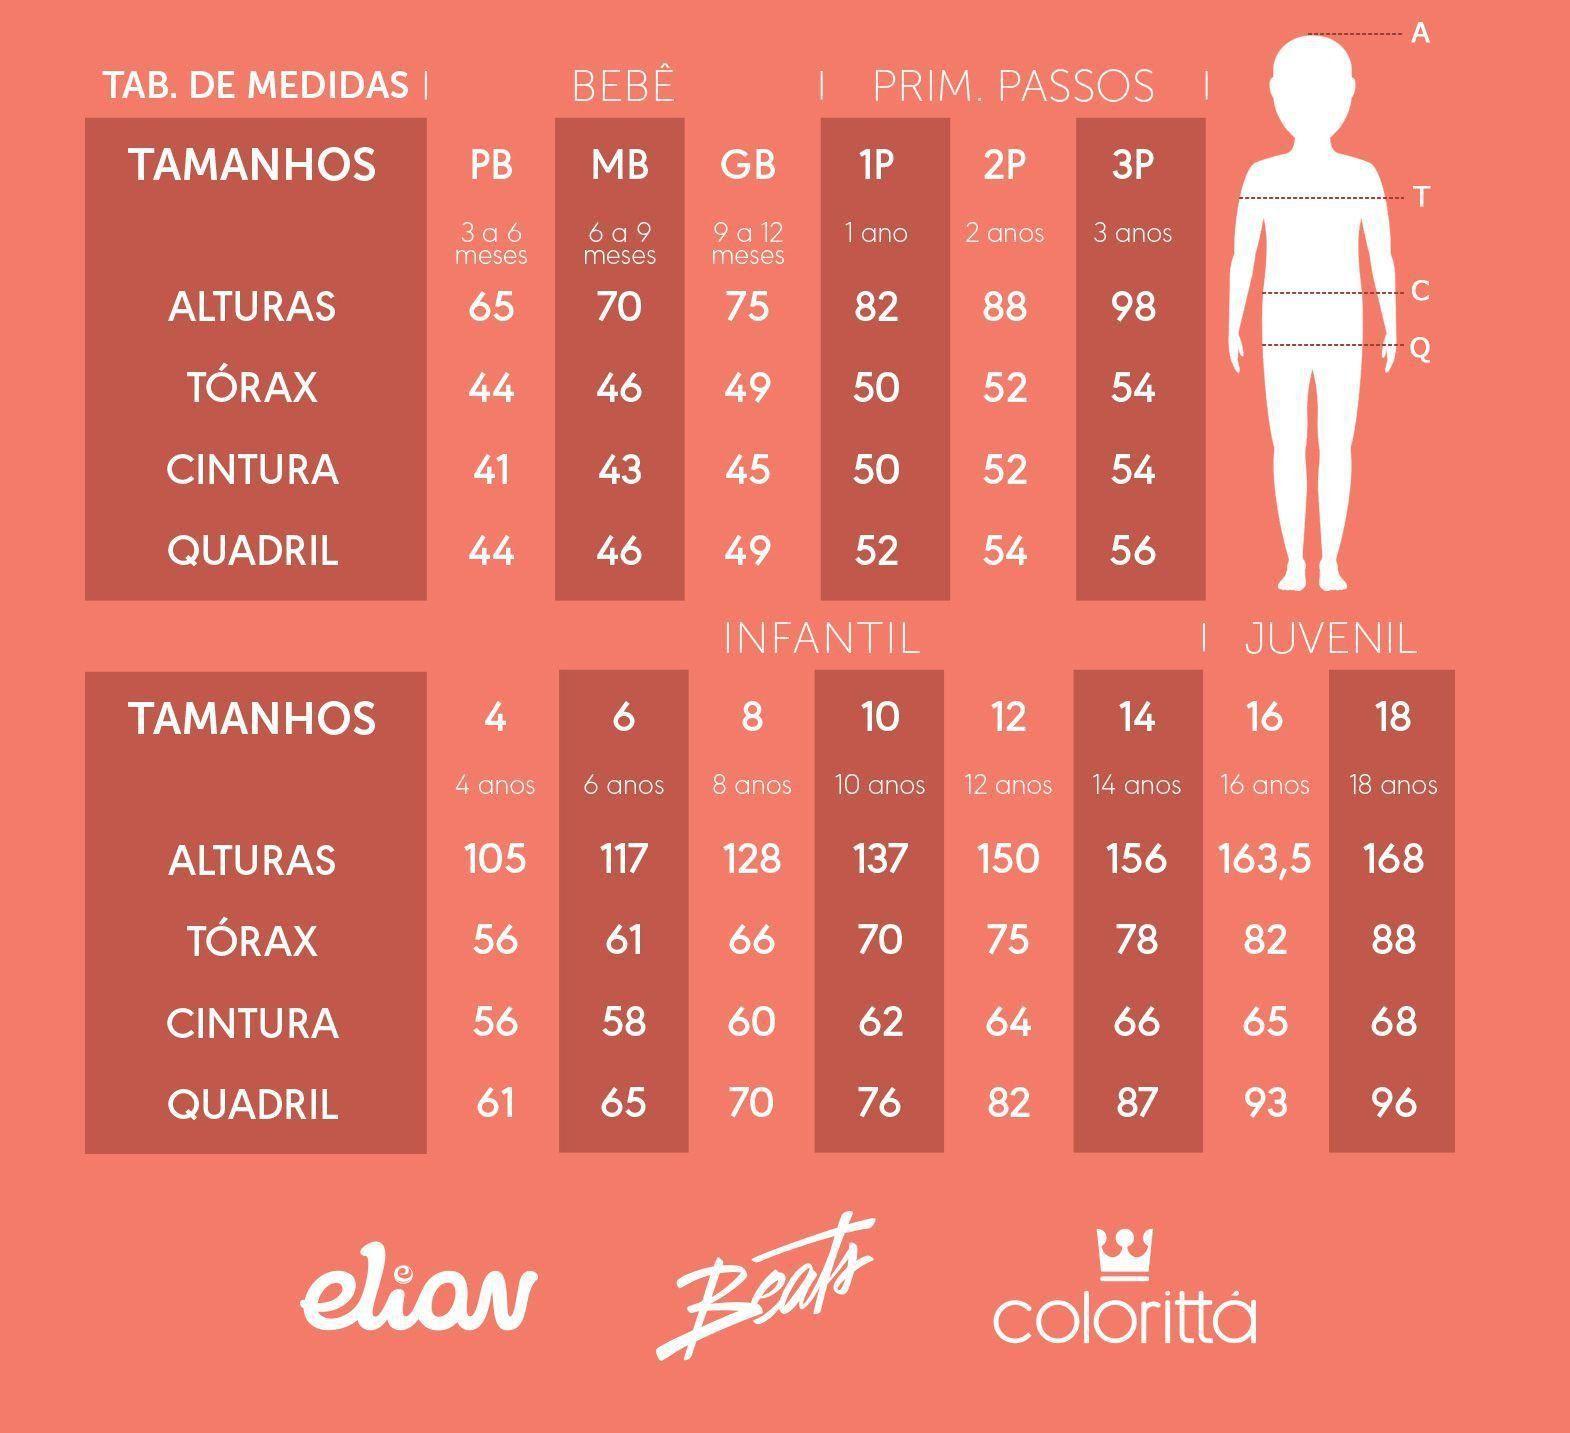 Jaqueta Infantil Masculina Cinza Keep - Elian: Tabela de medidas